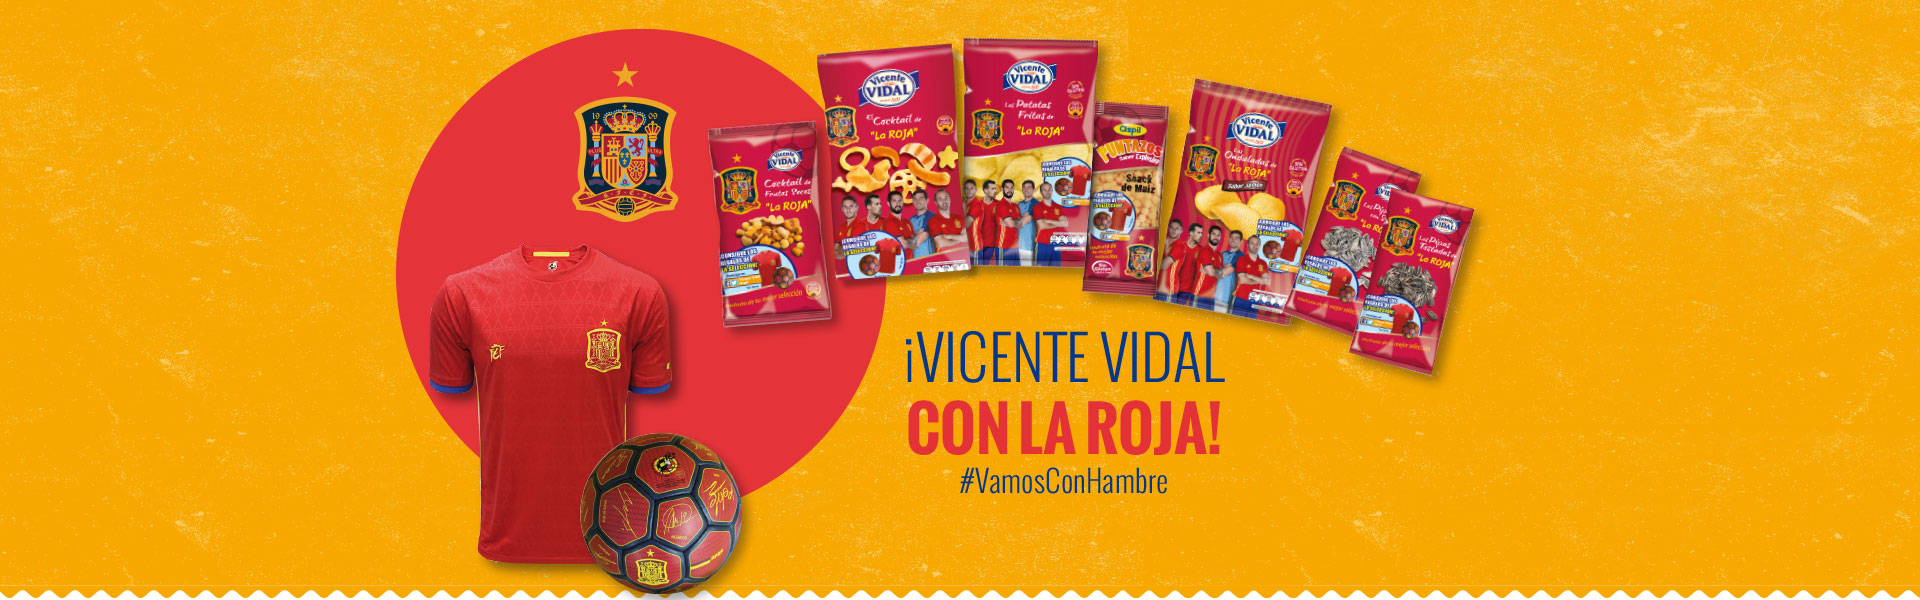 Vicente Vidal con La Roja